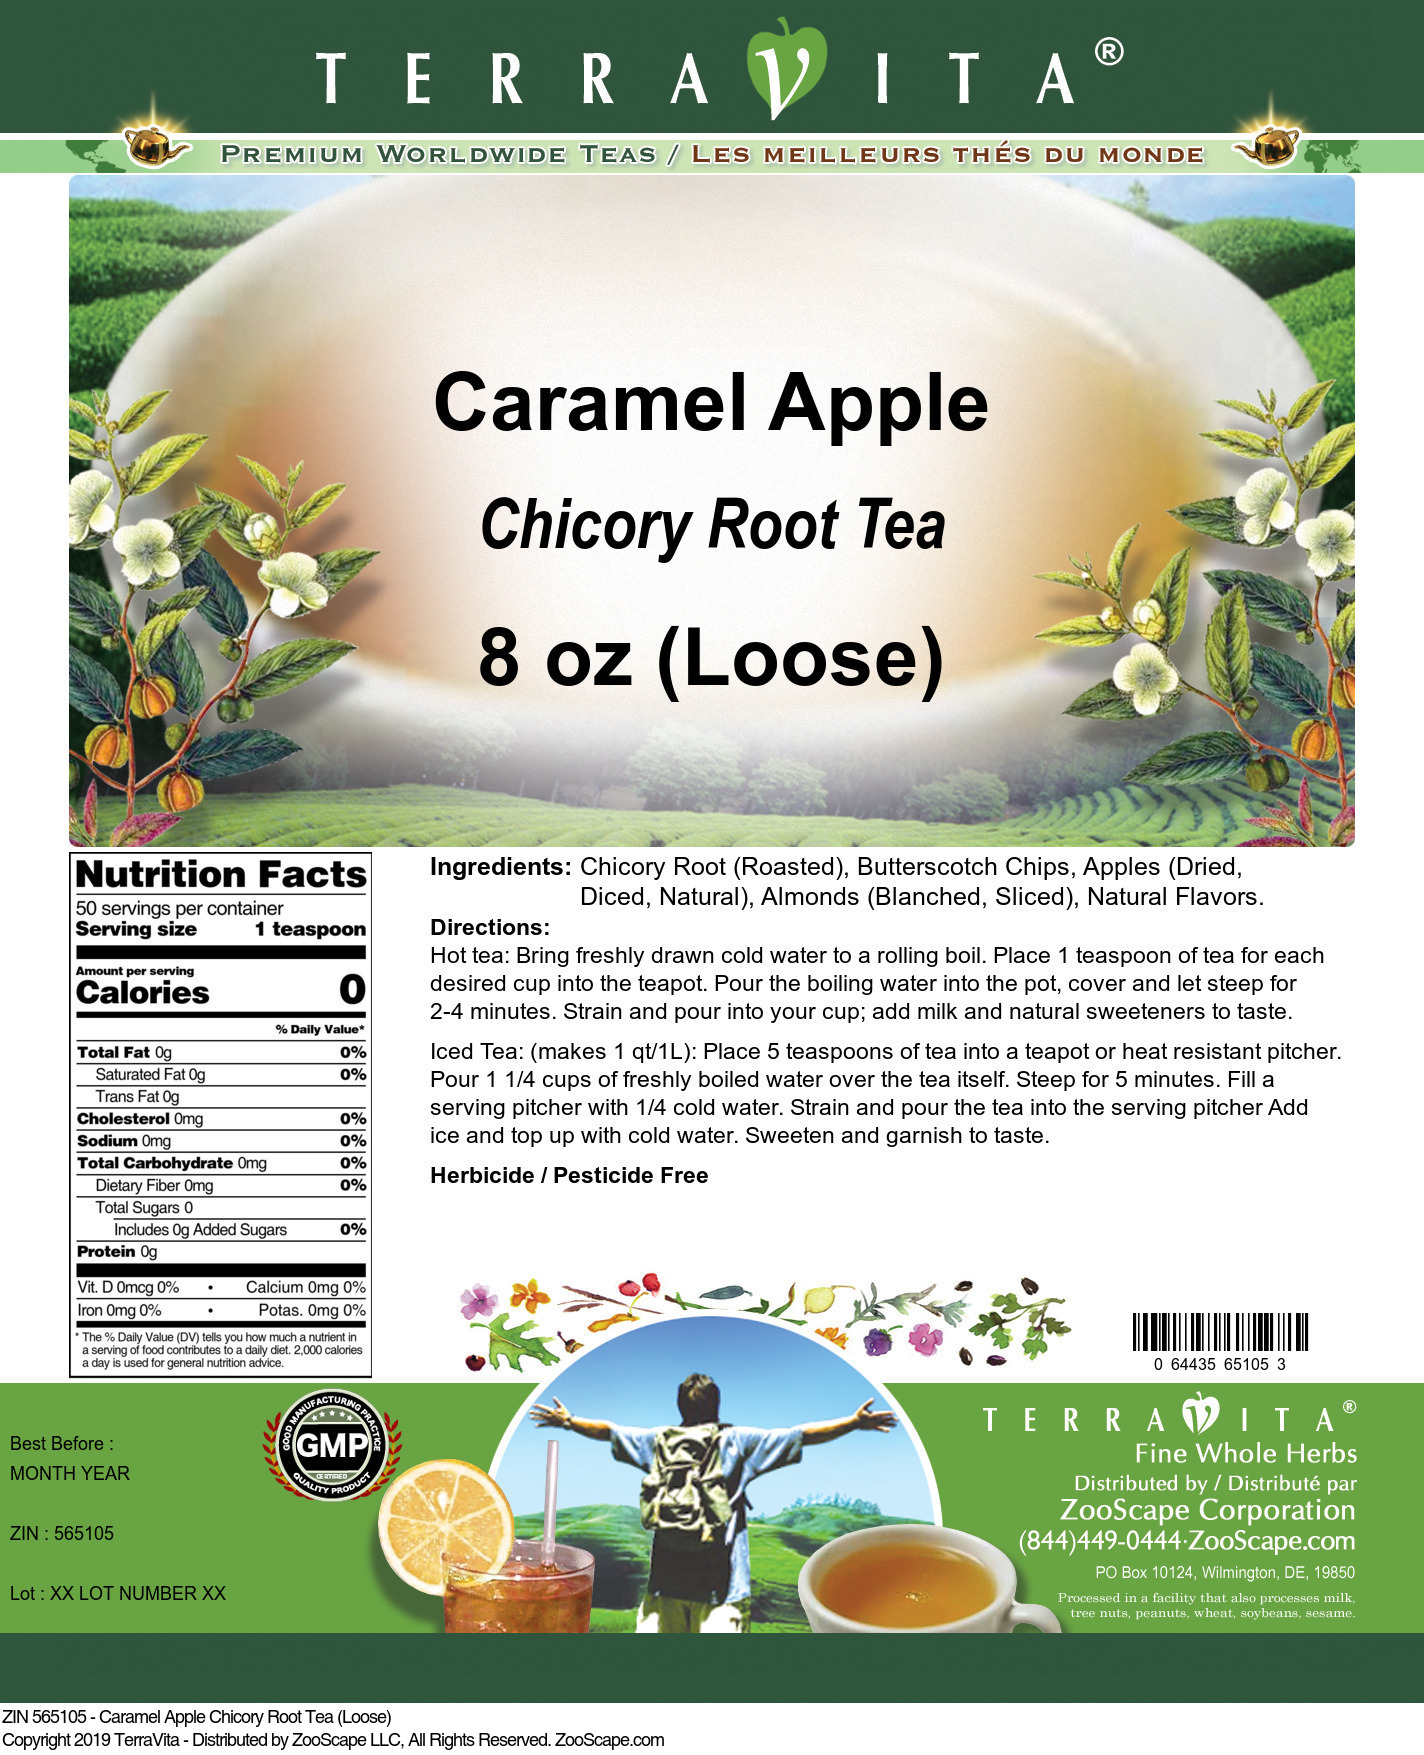 Caramel Apple Chicory Root